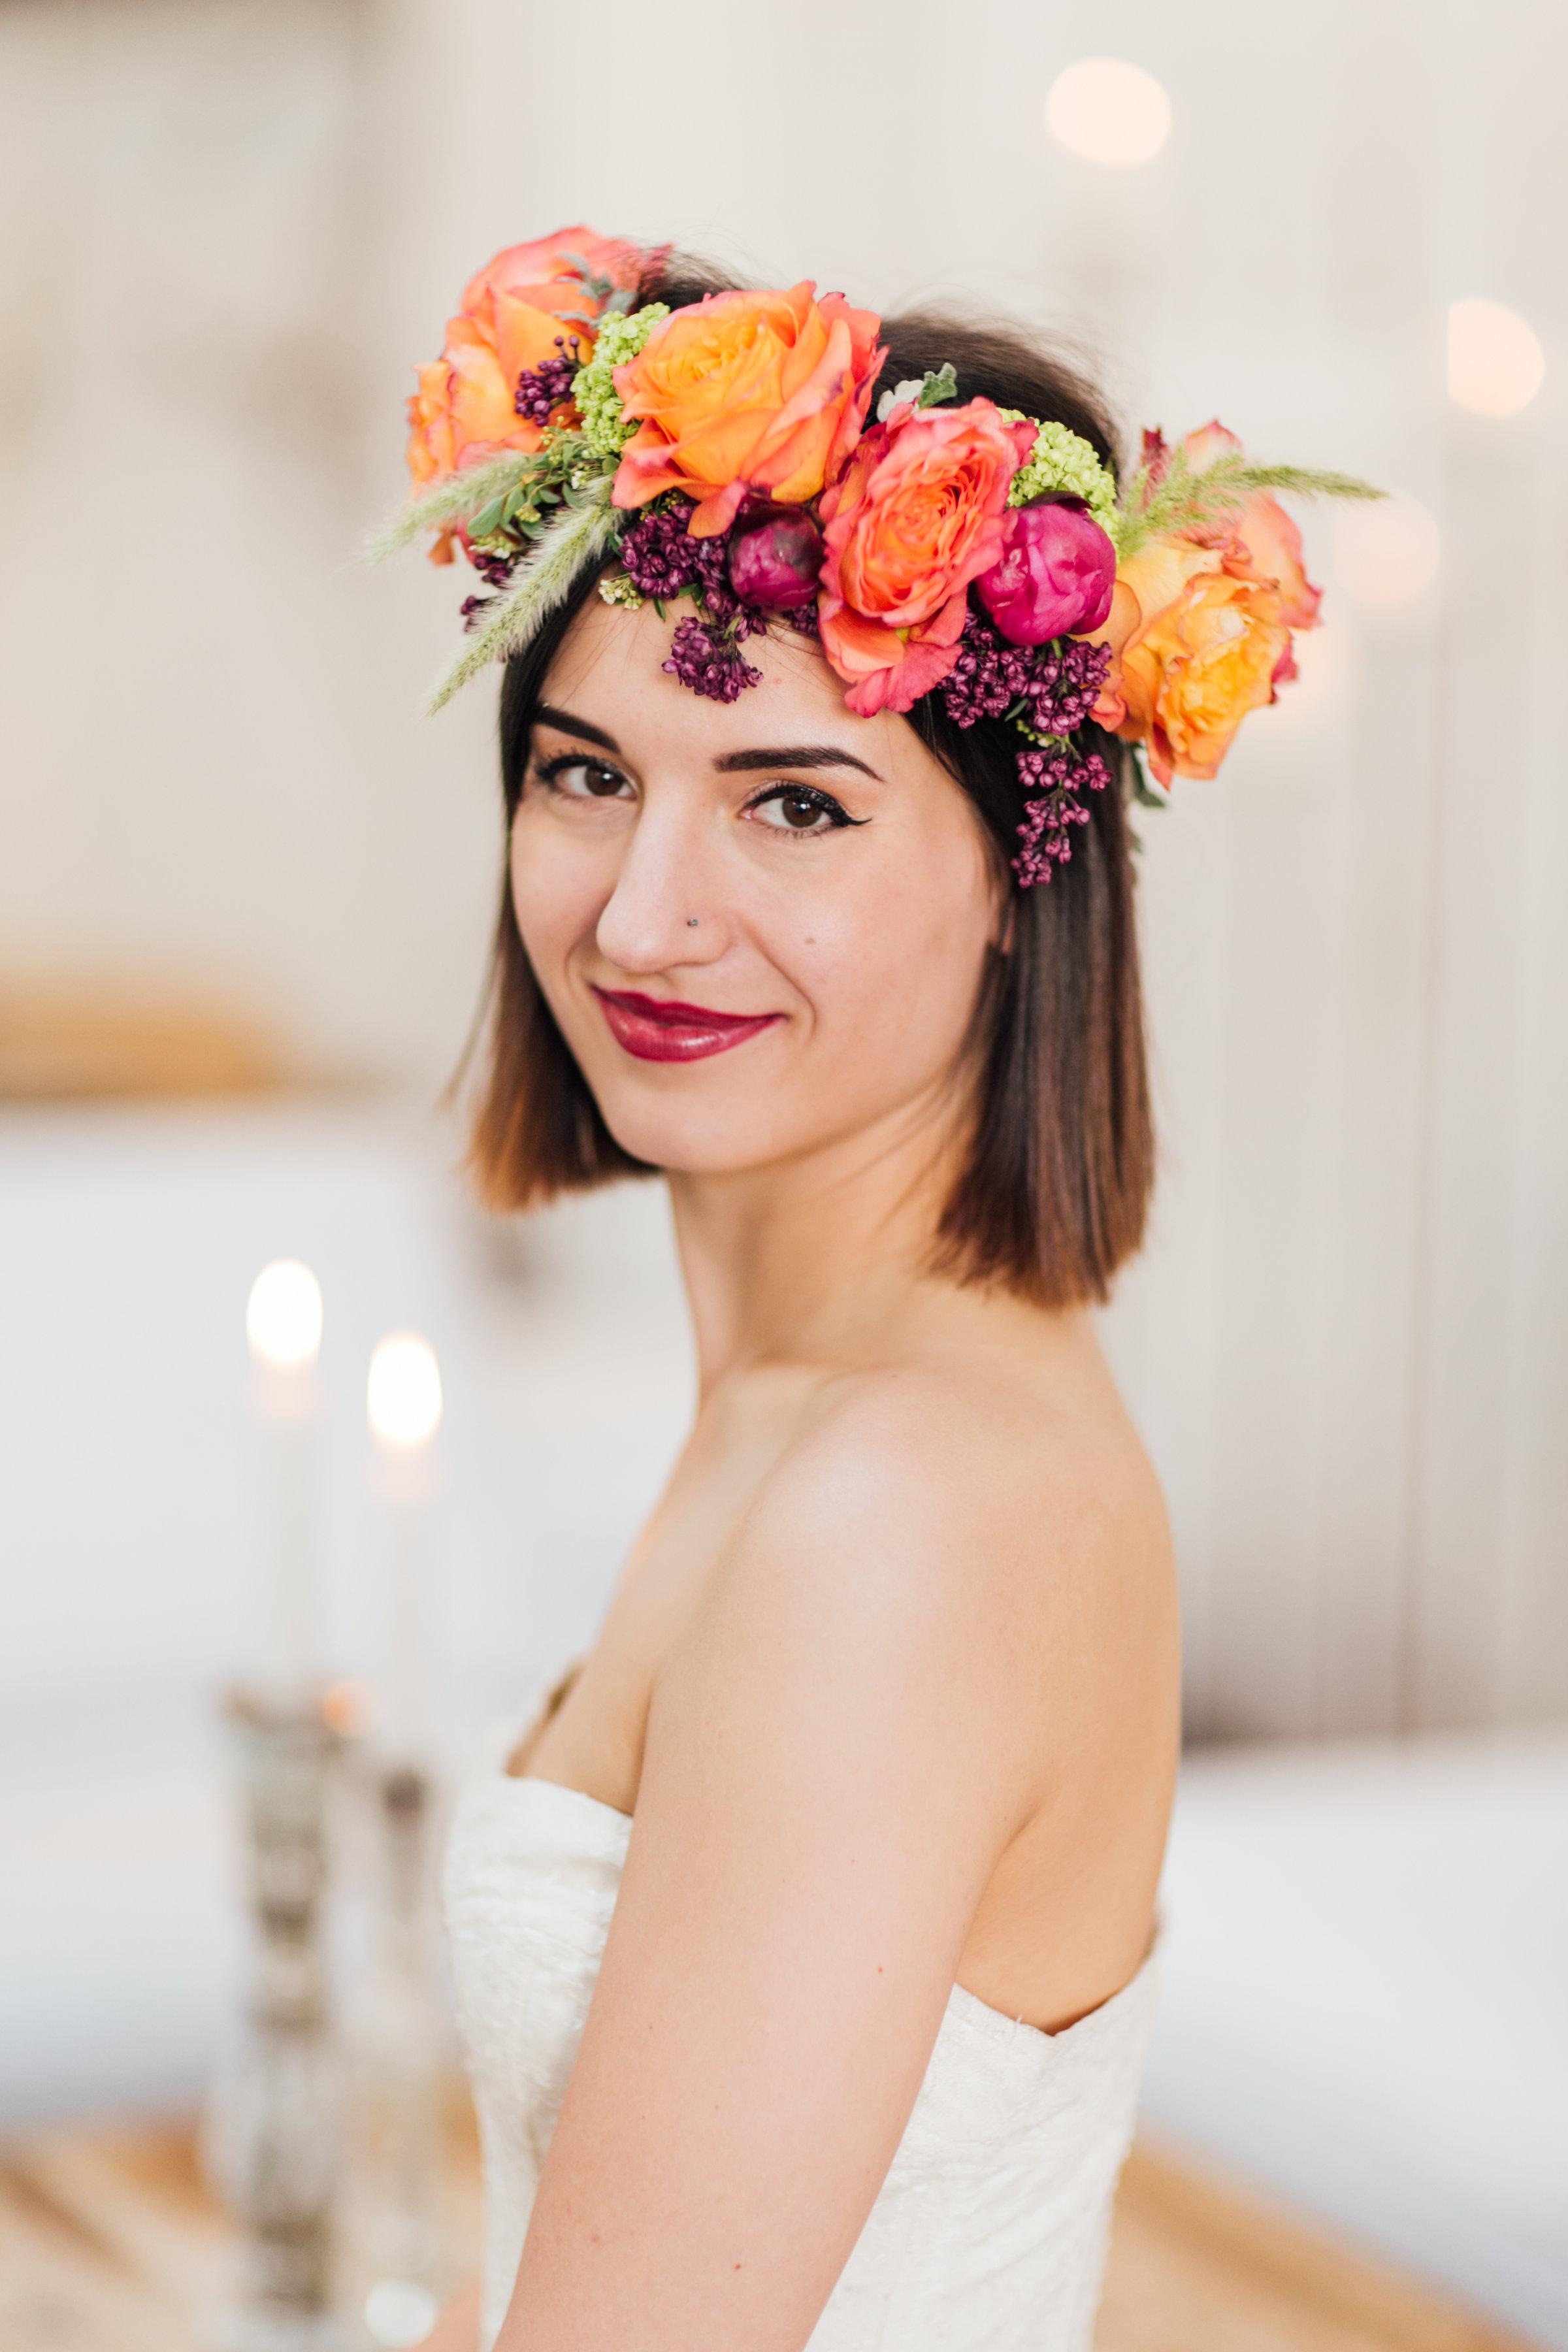 104_NYC-wedding-photographer-Amber-Marlow.jpg